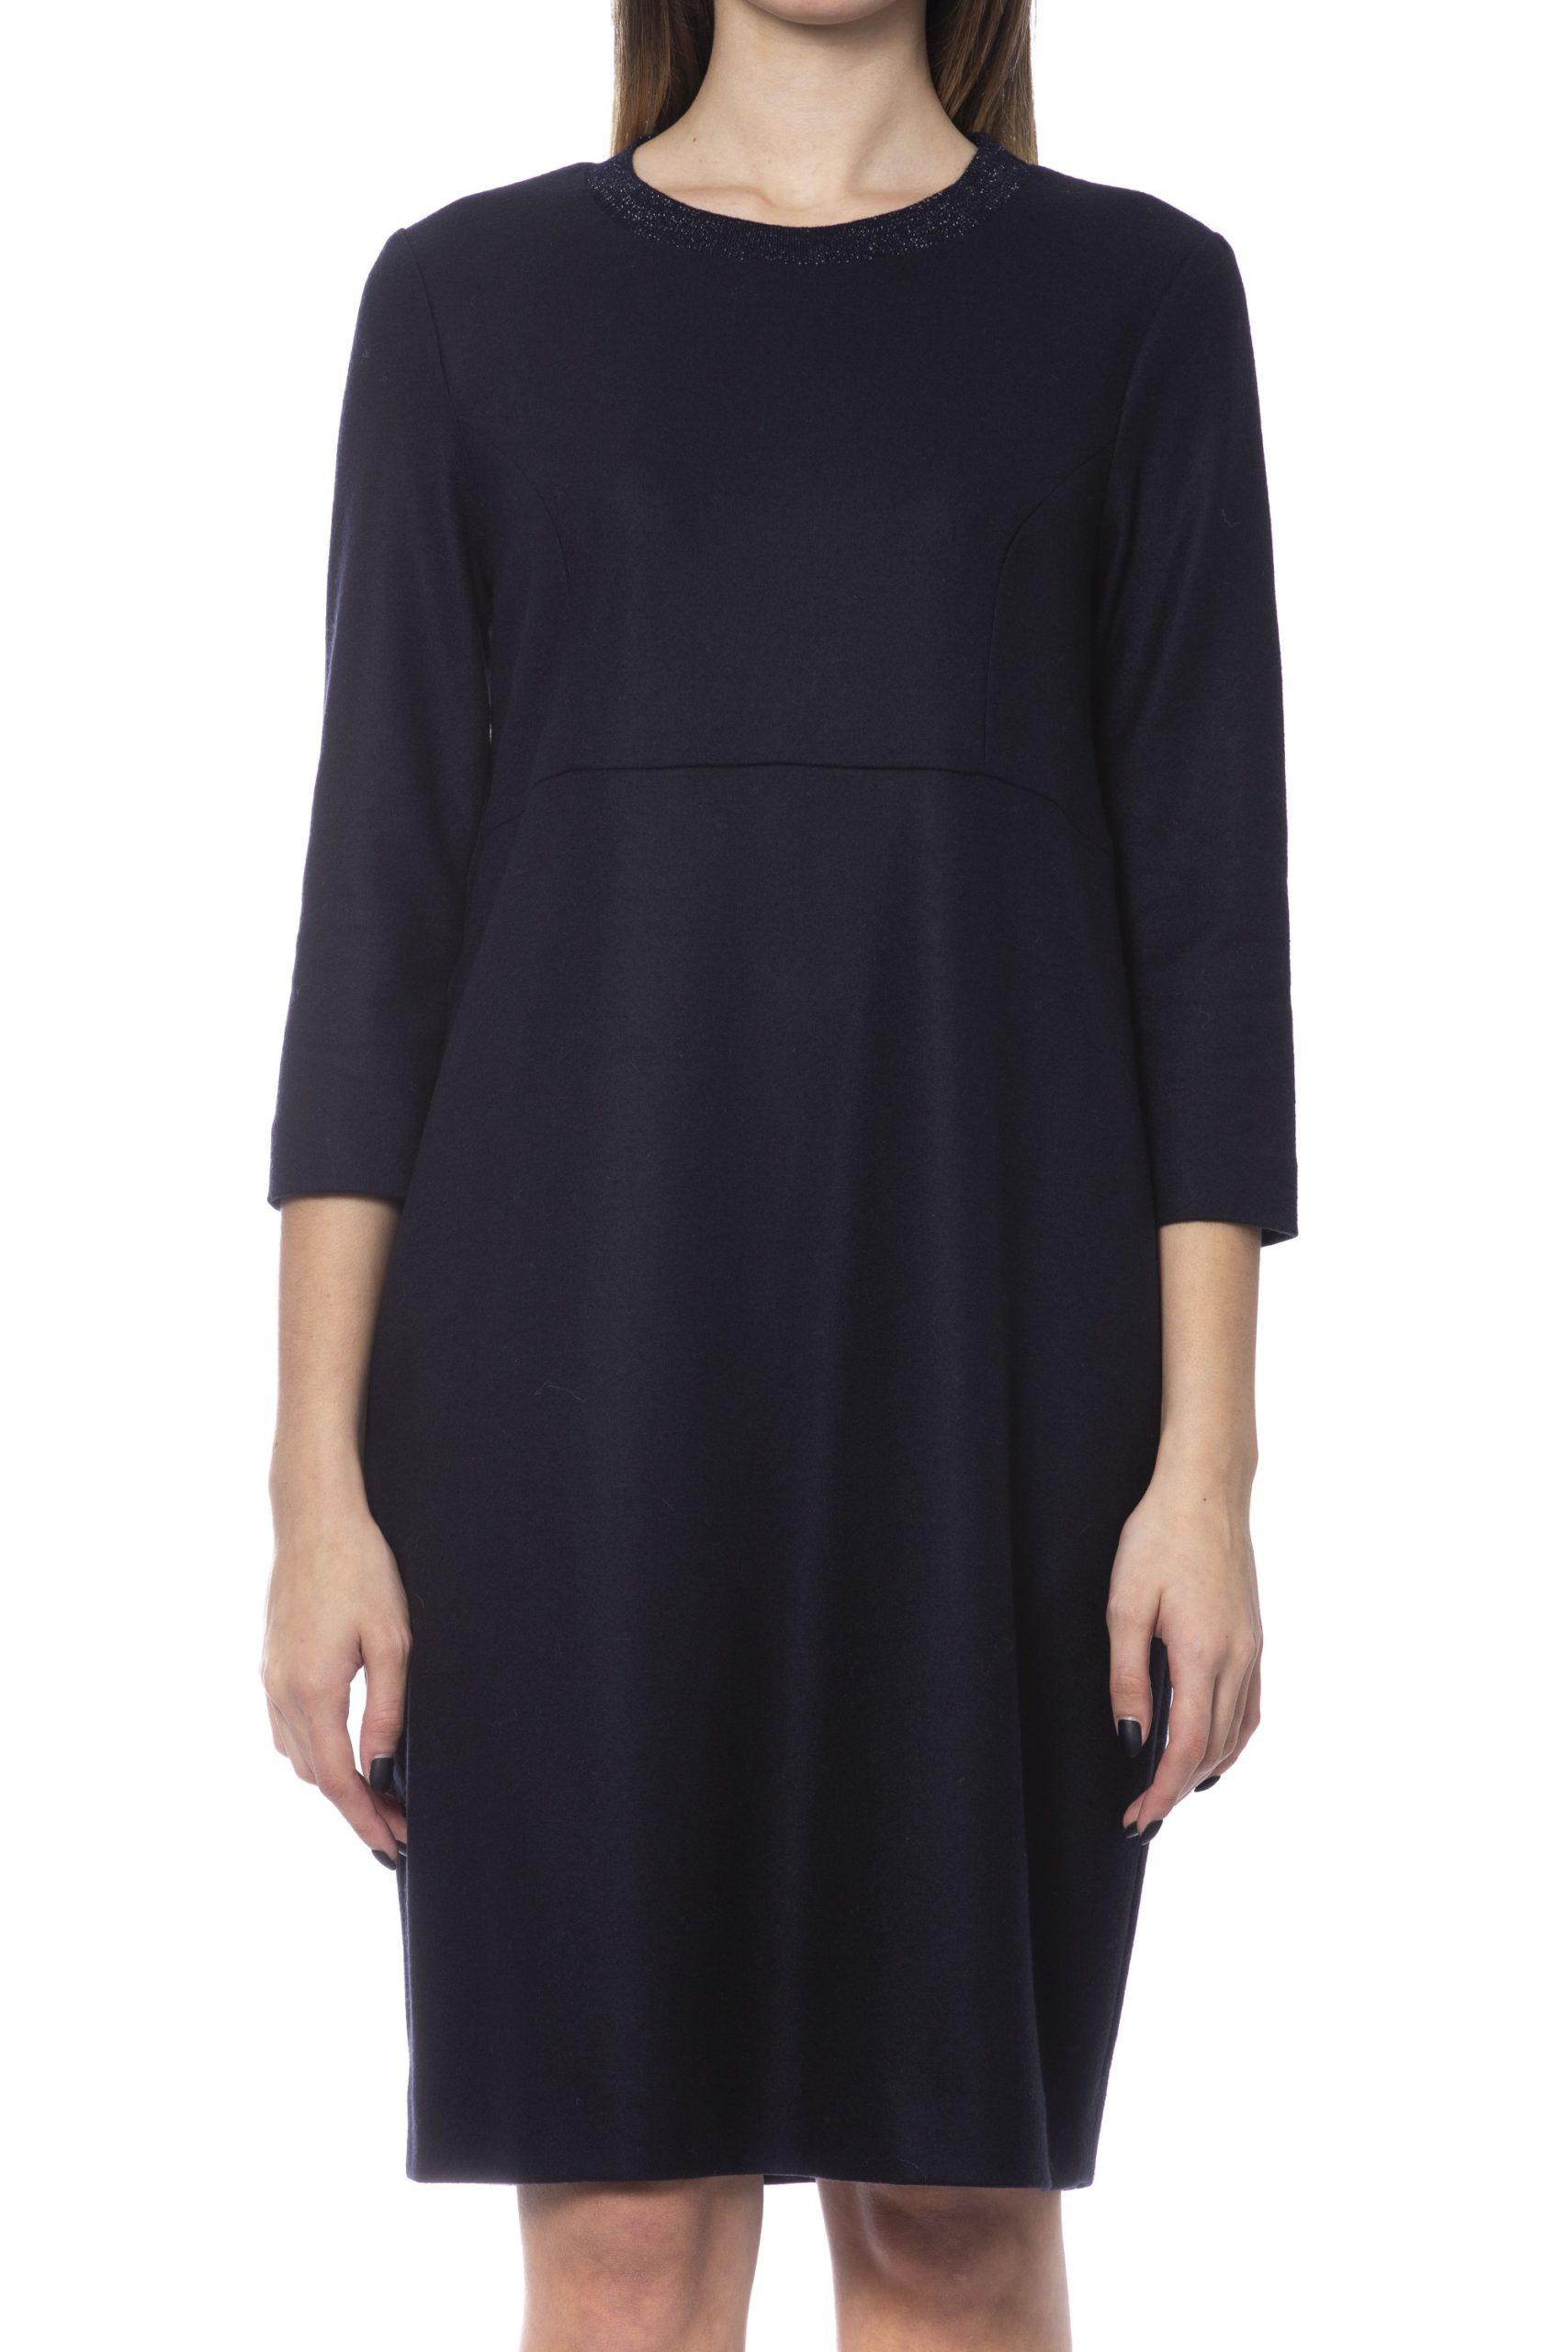 Peserico Women's Dress Blue PE993684 - IT48   XL